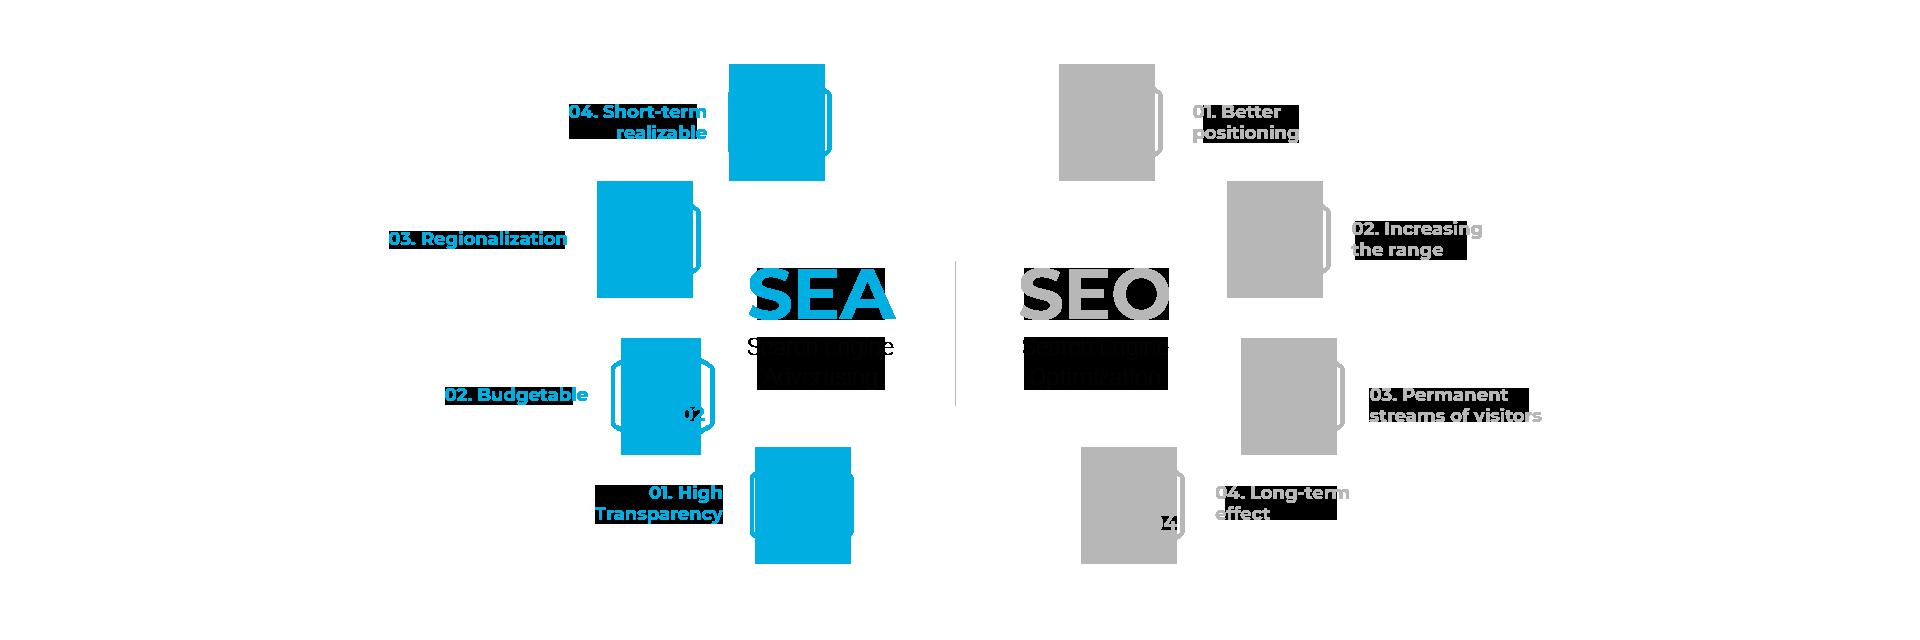 Digital Marketing - Advantages SEA and SEO